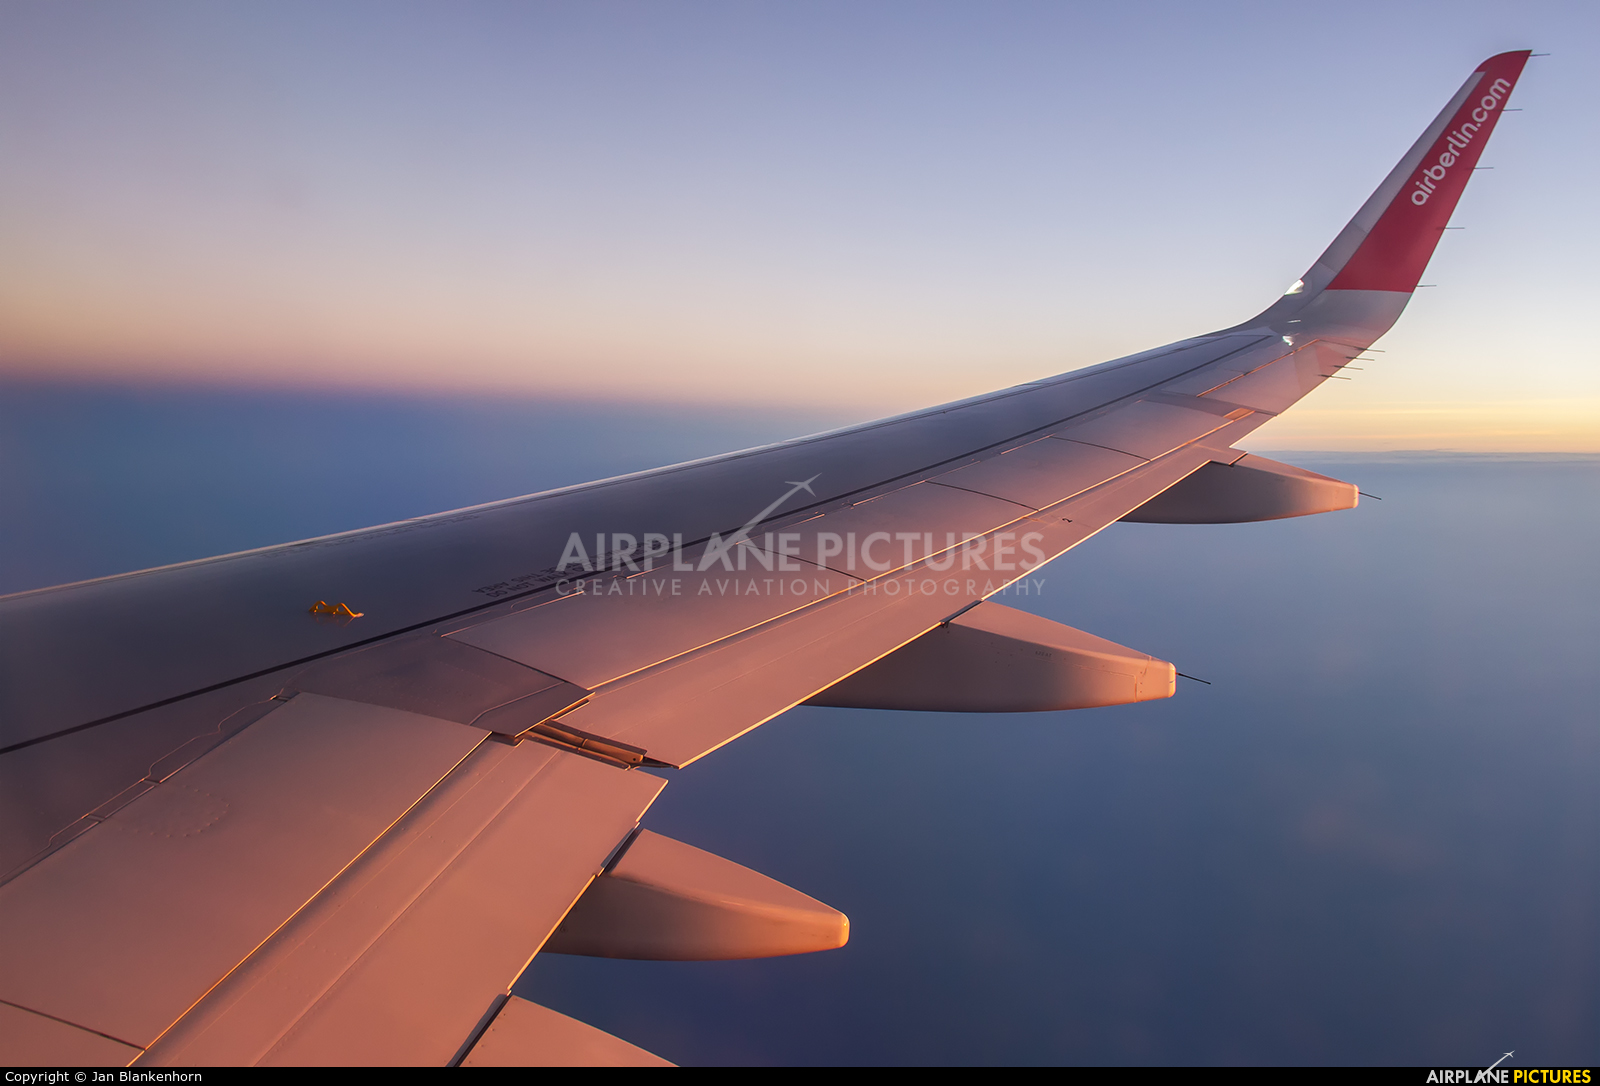 Air Berlin D-ABNJ aircraft at In Flight - UAE